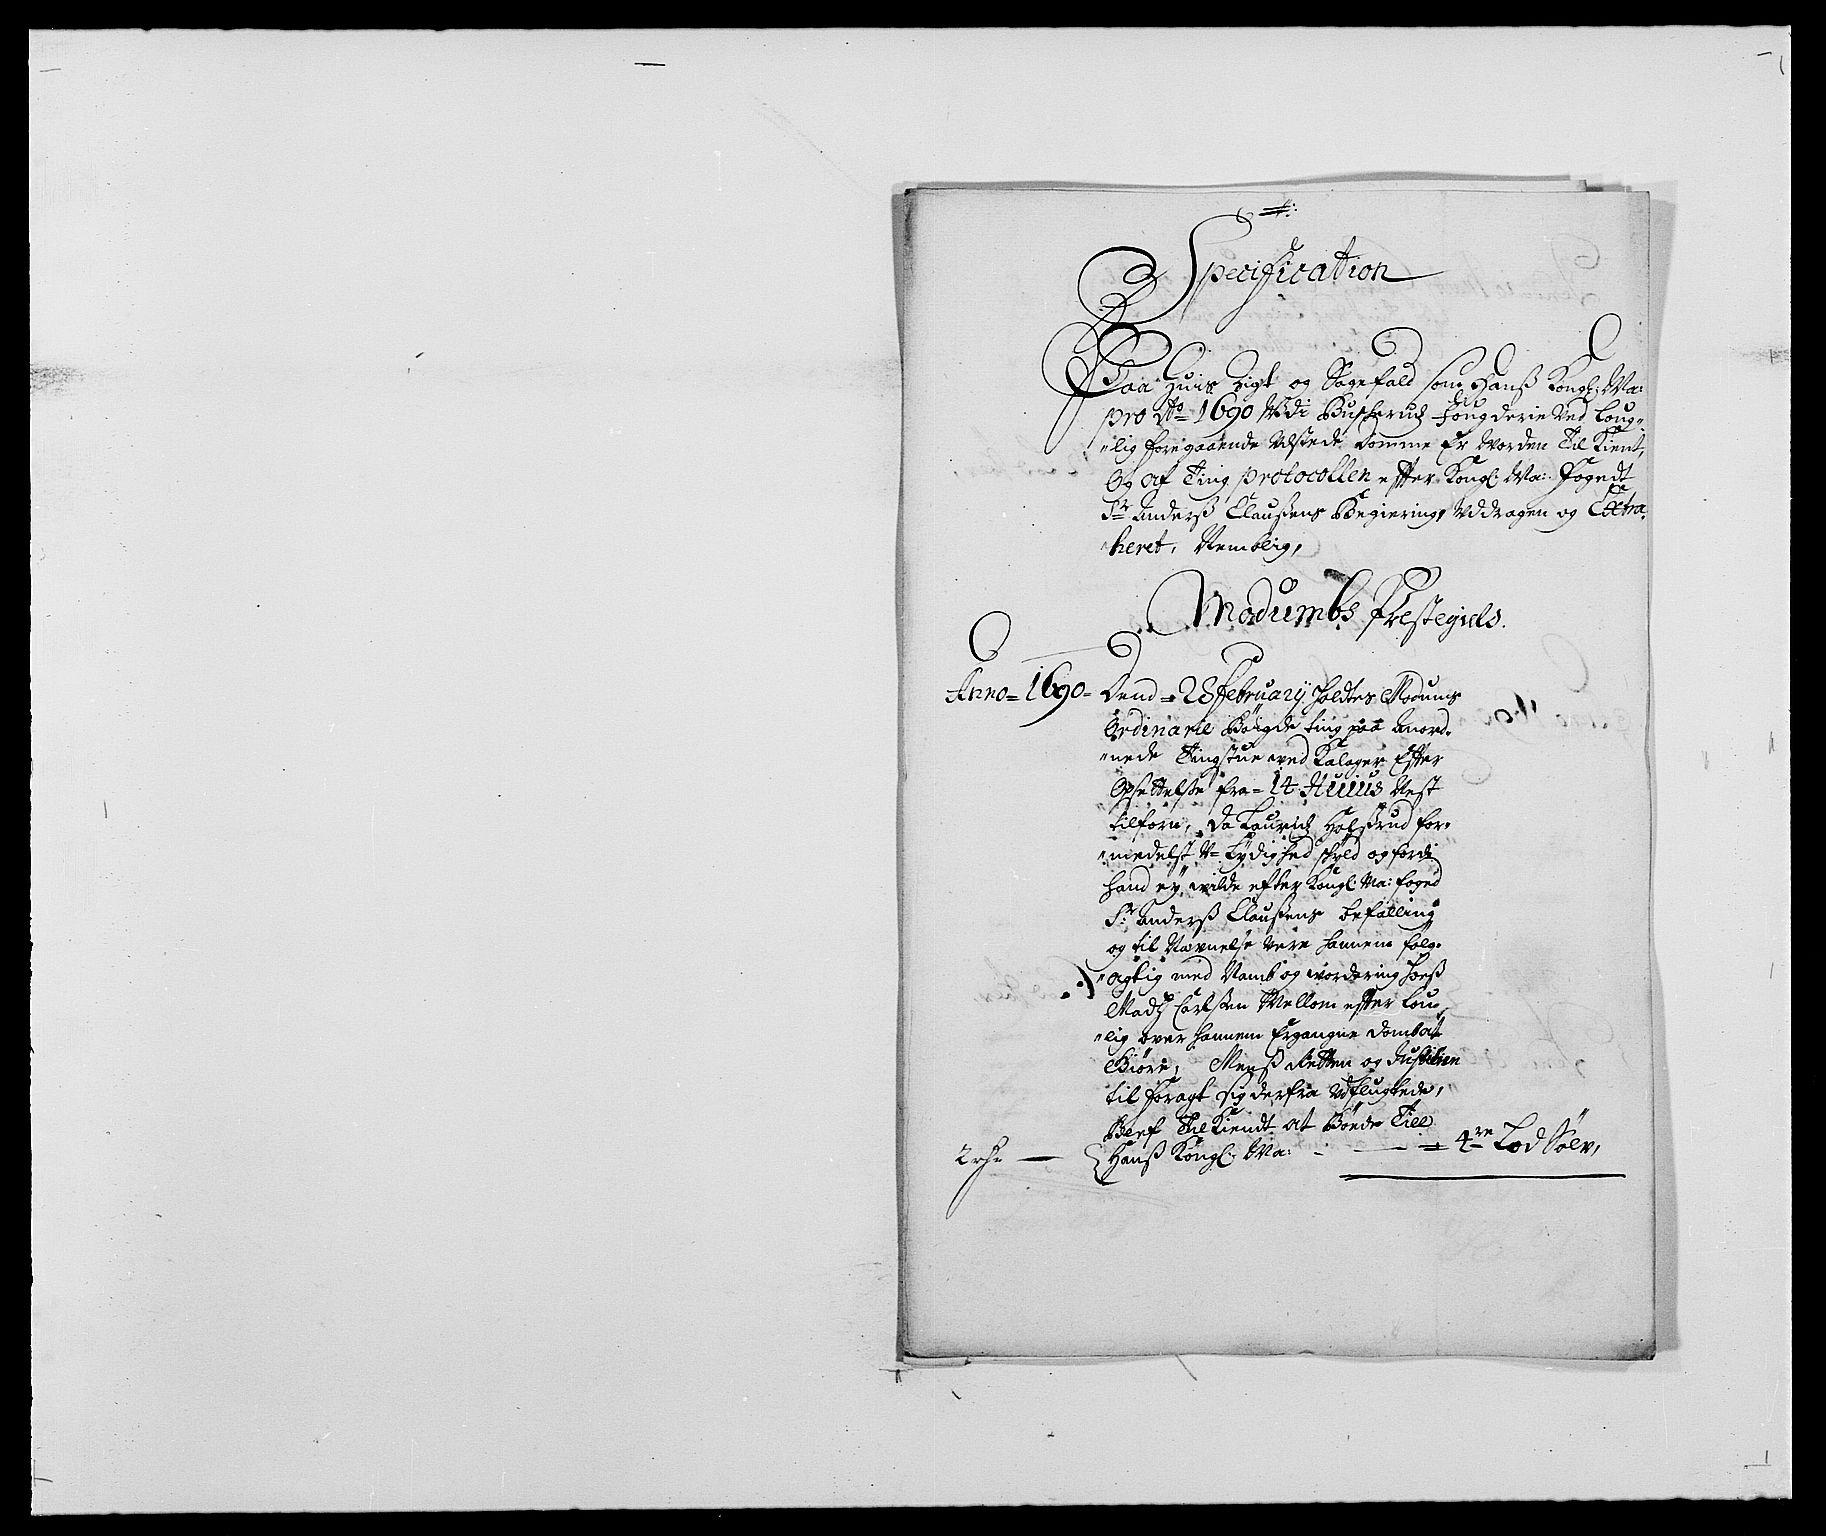 RA, Rentekammeret inntil 1814, Reviderte regnskaper, Fogderegnskap, R25/L1680: Fogderegnskap Buskerud, 1689-1690, s. 285